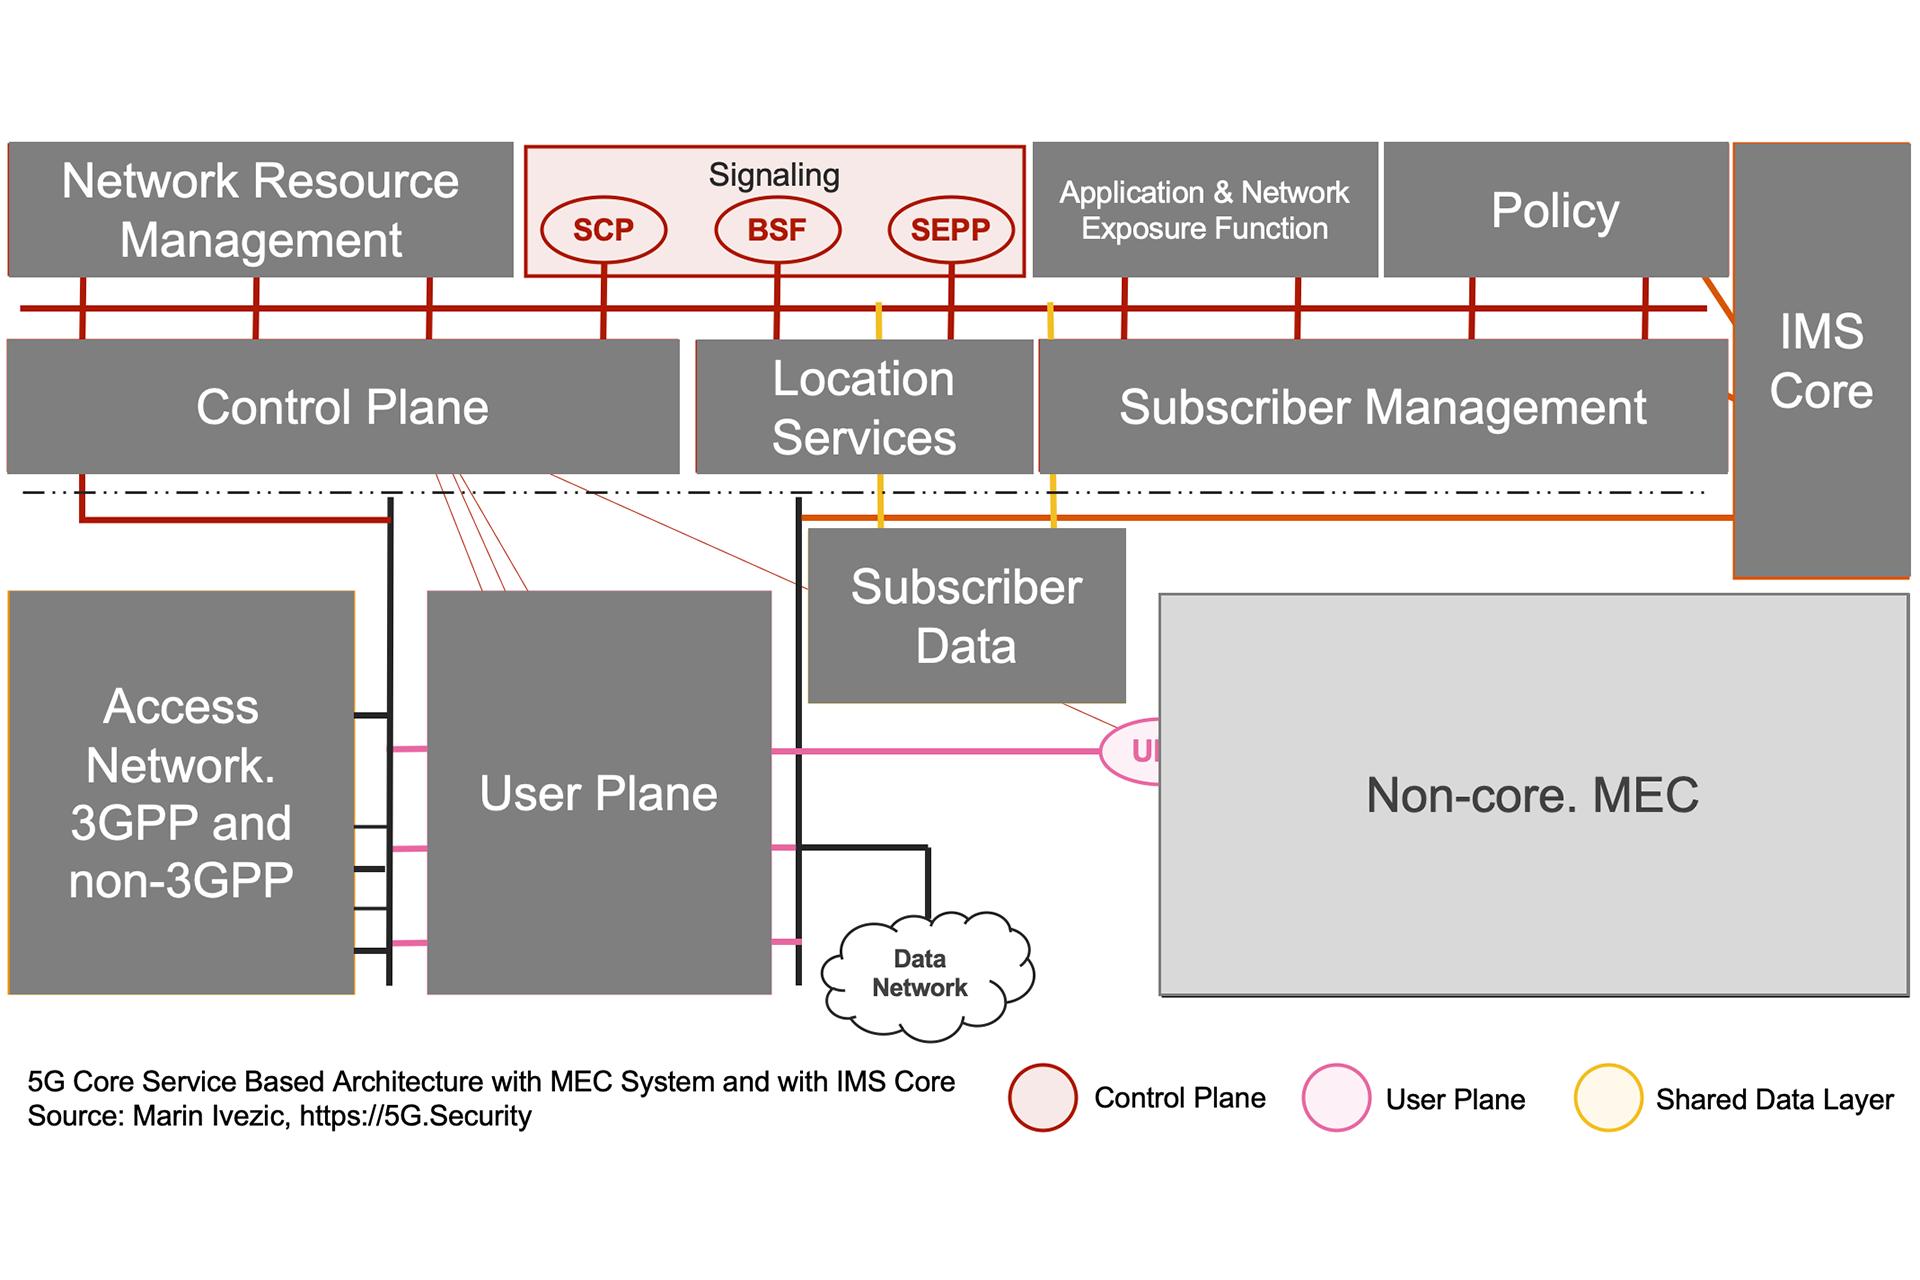 5G SBA IMS MEC Architecture - Signaling